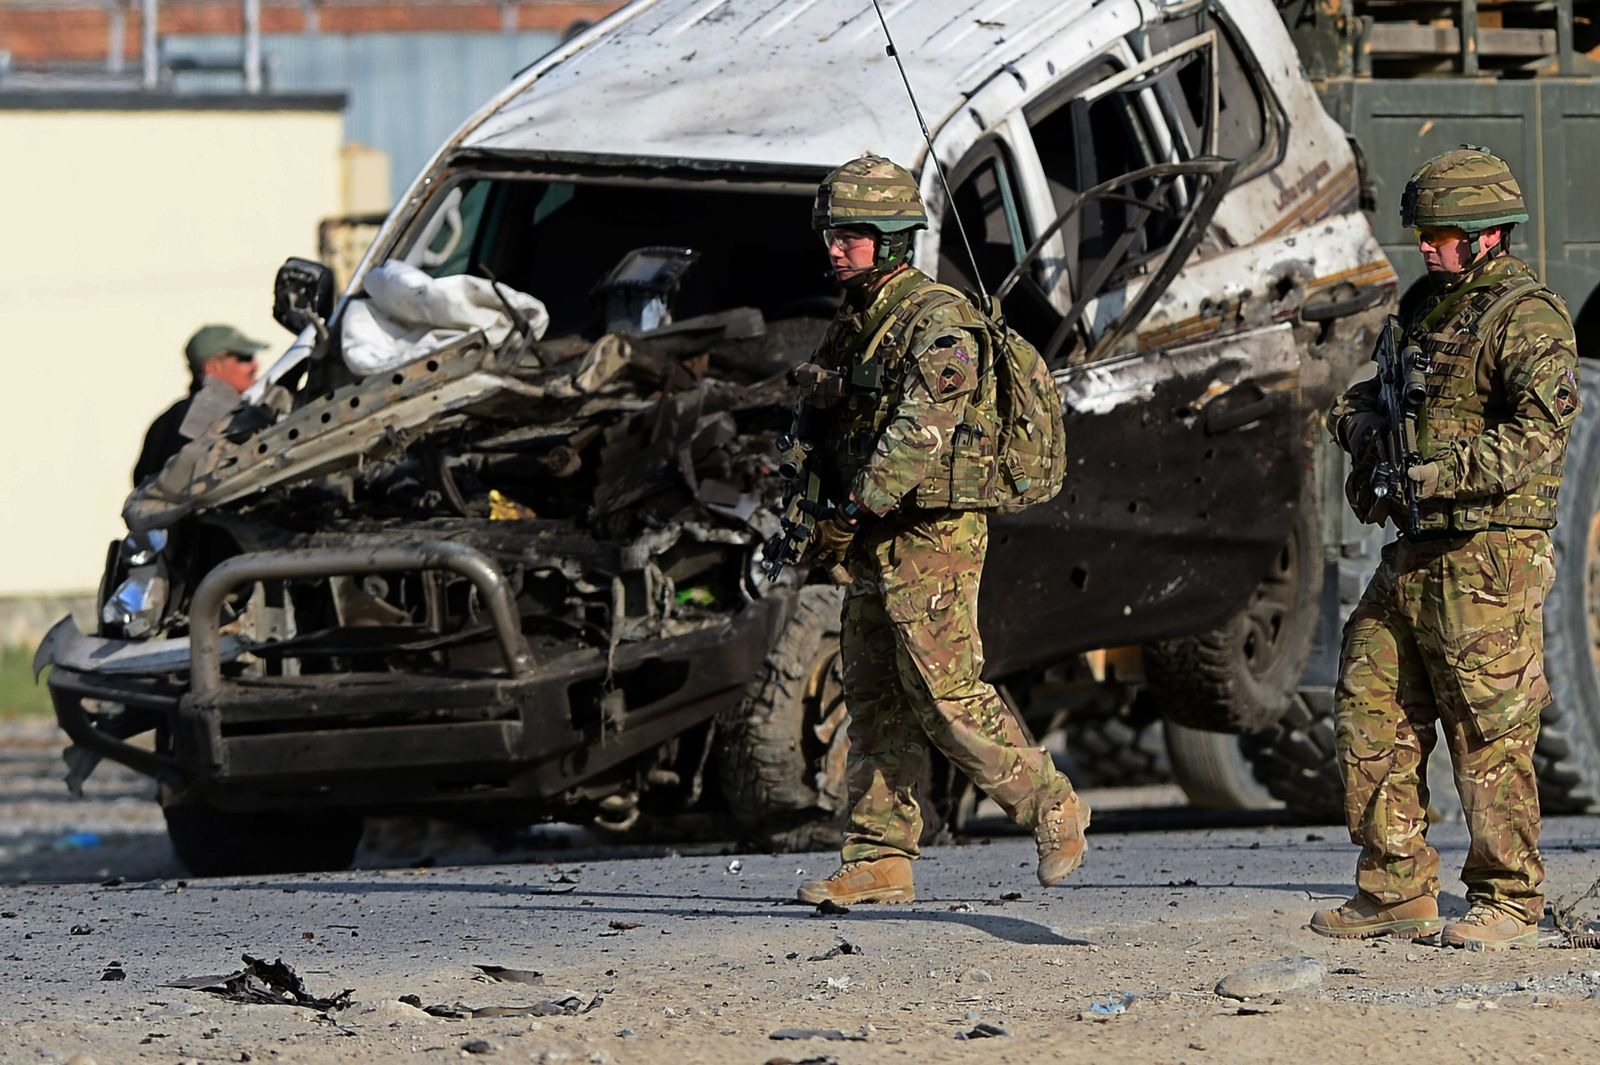 AFGHANISTAN-UNREST-SUICIDE-ATTACK